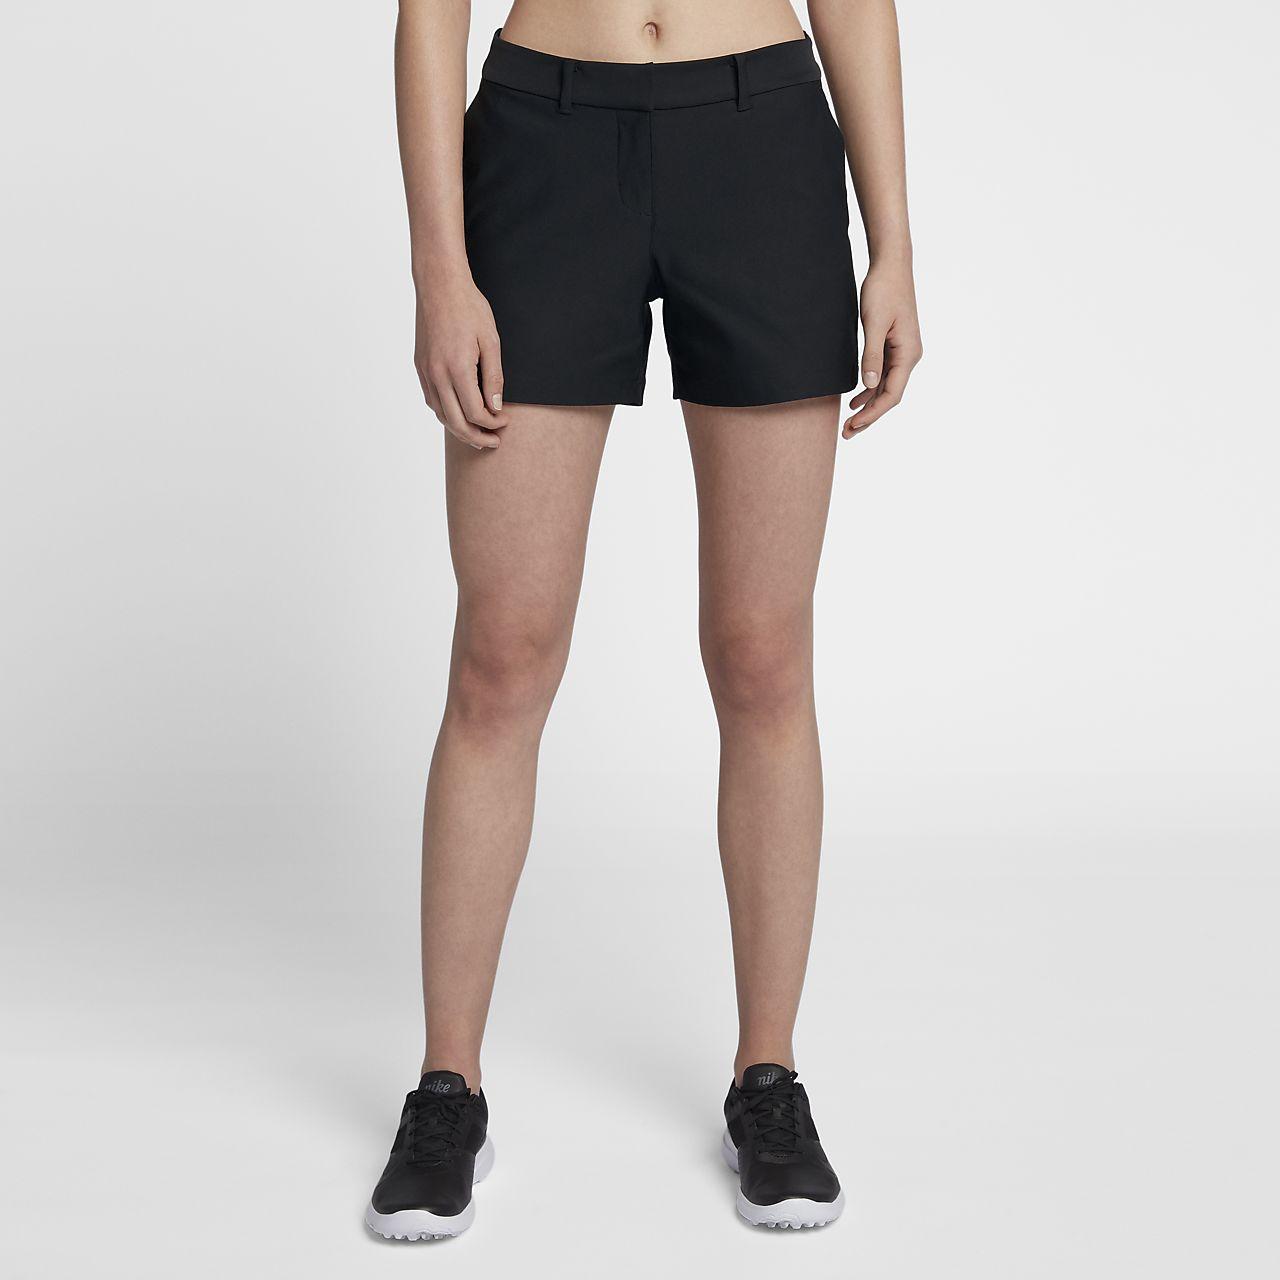 bd93ac7b137 Nike Flex Women's 4.5